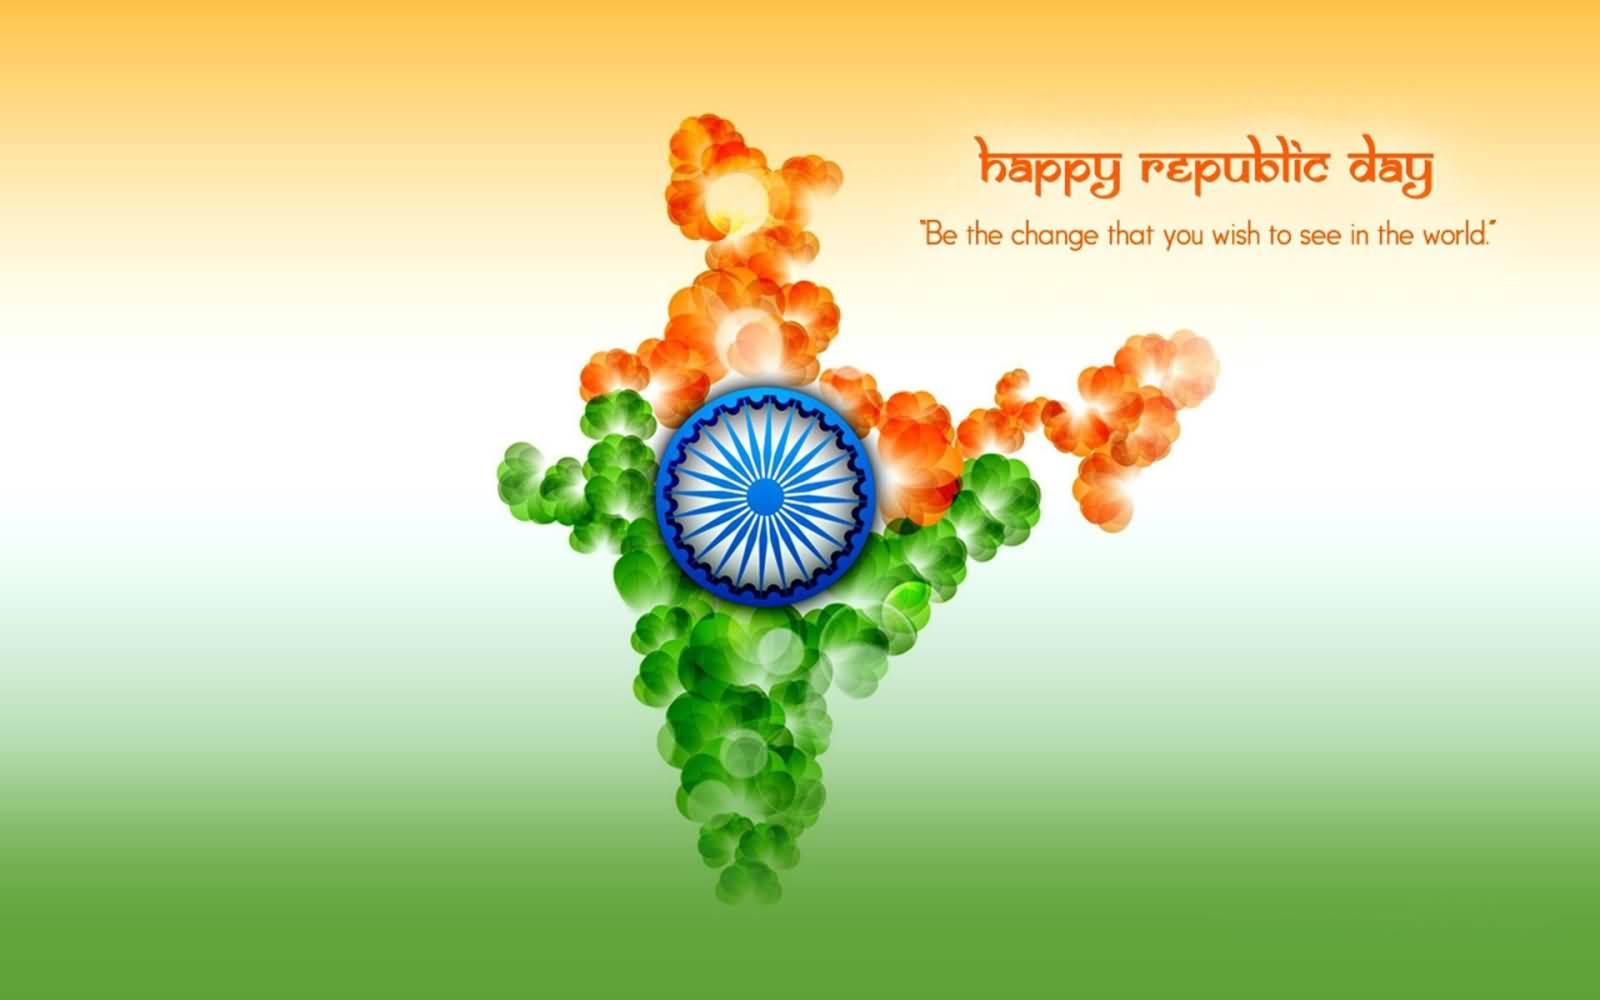 Republic Day 2020 Hd Pics For Facebook